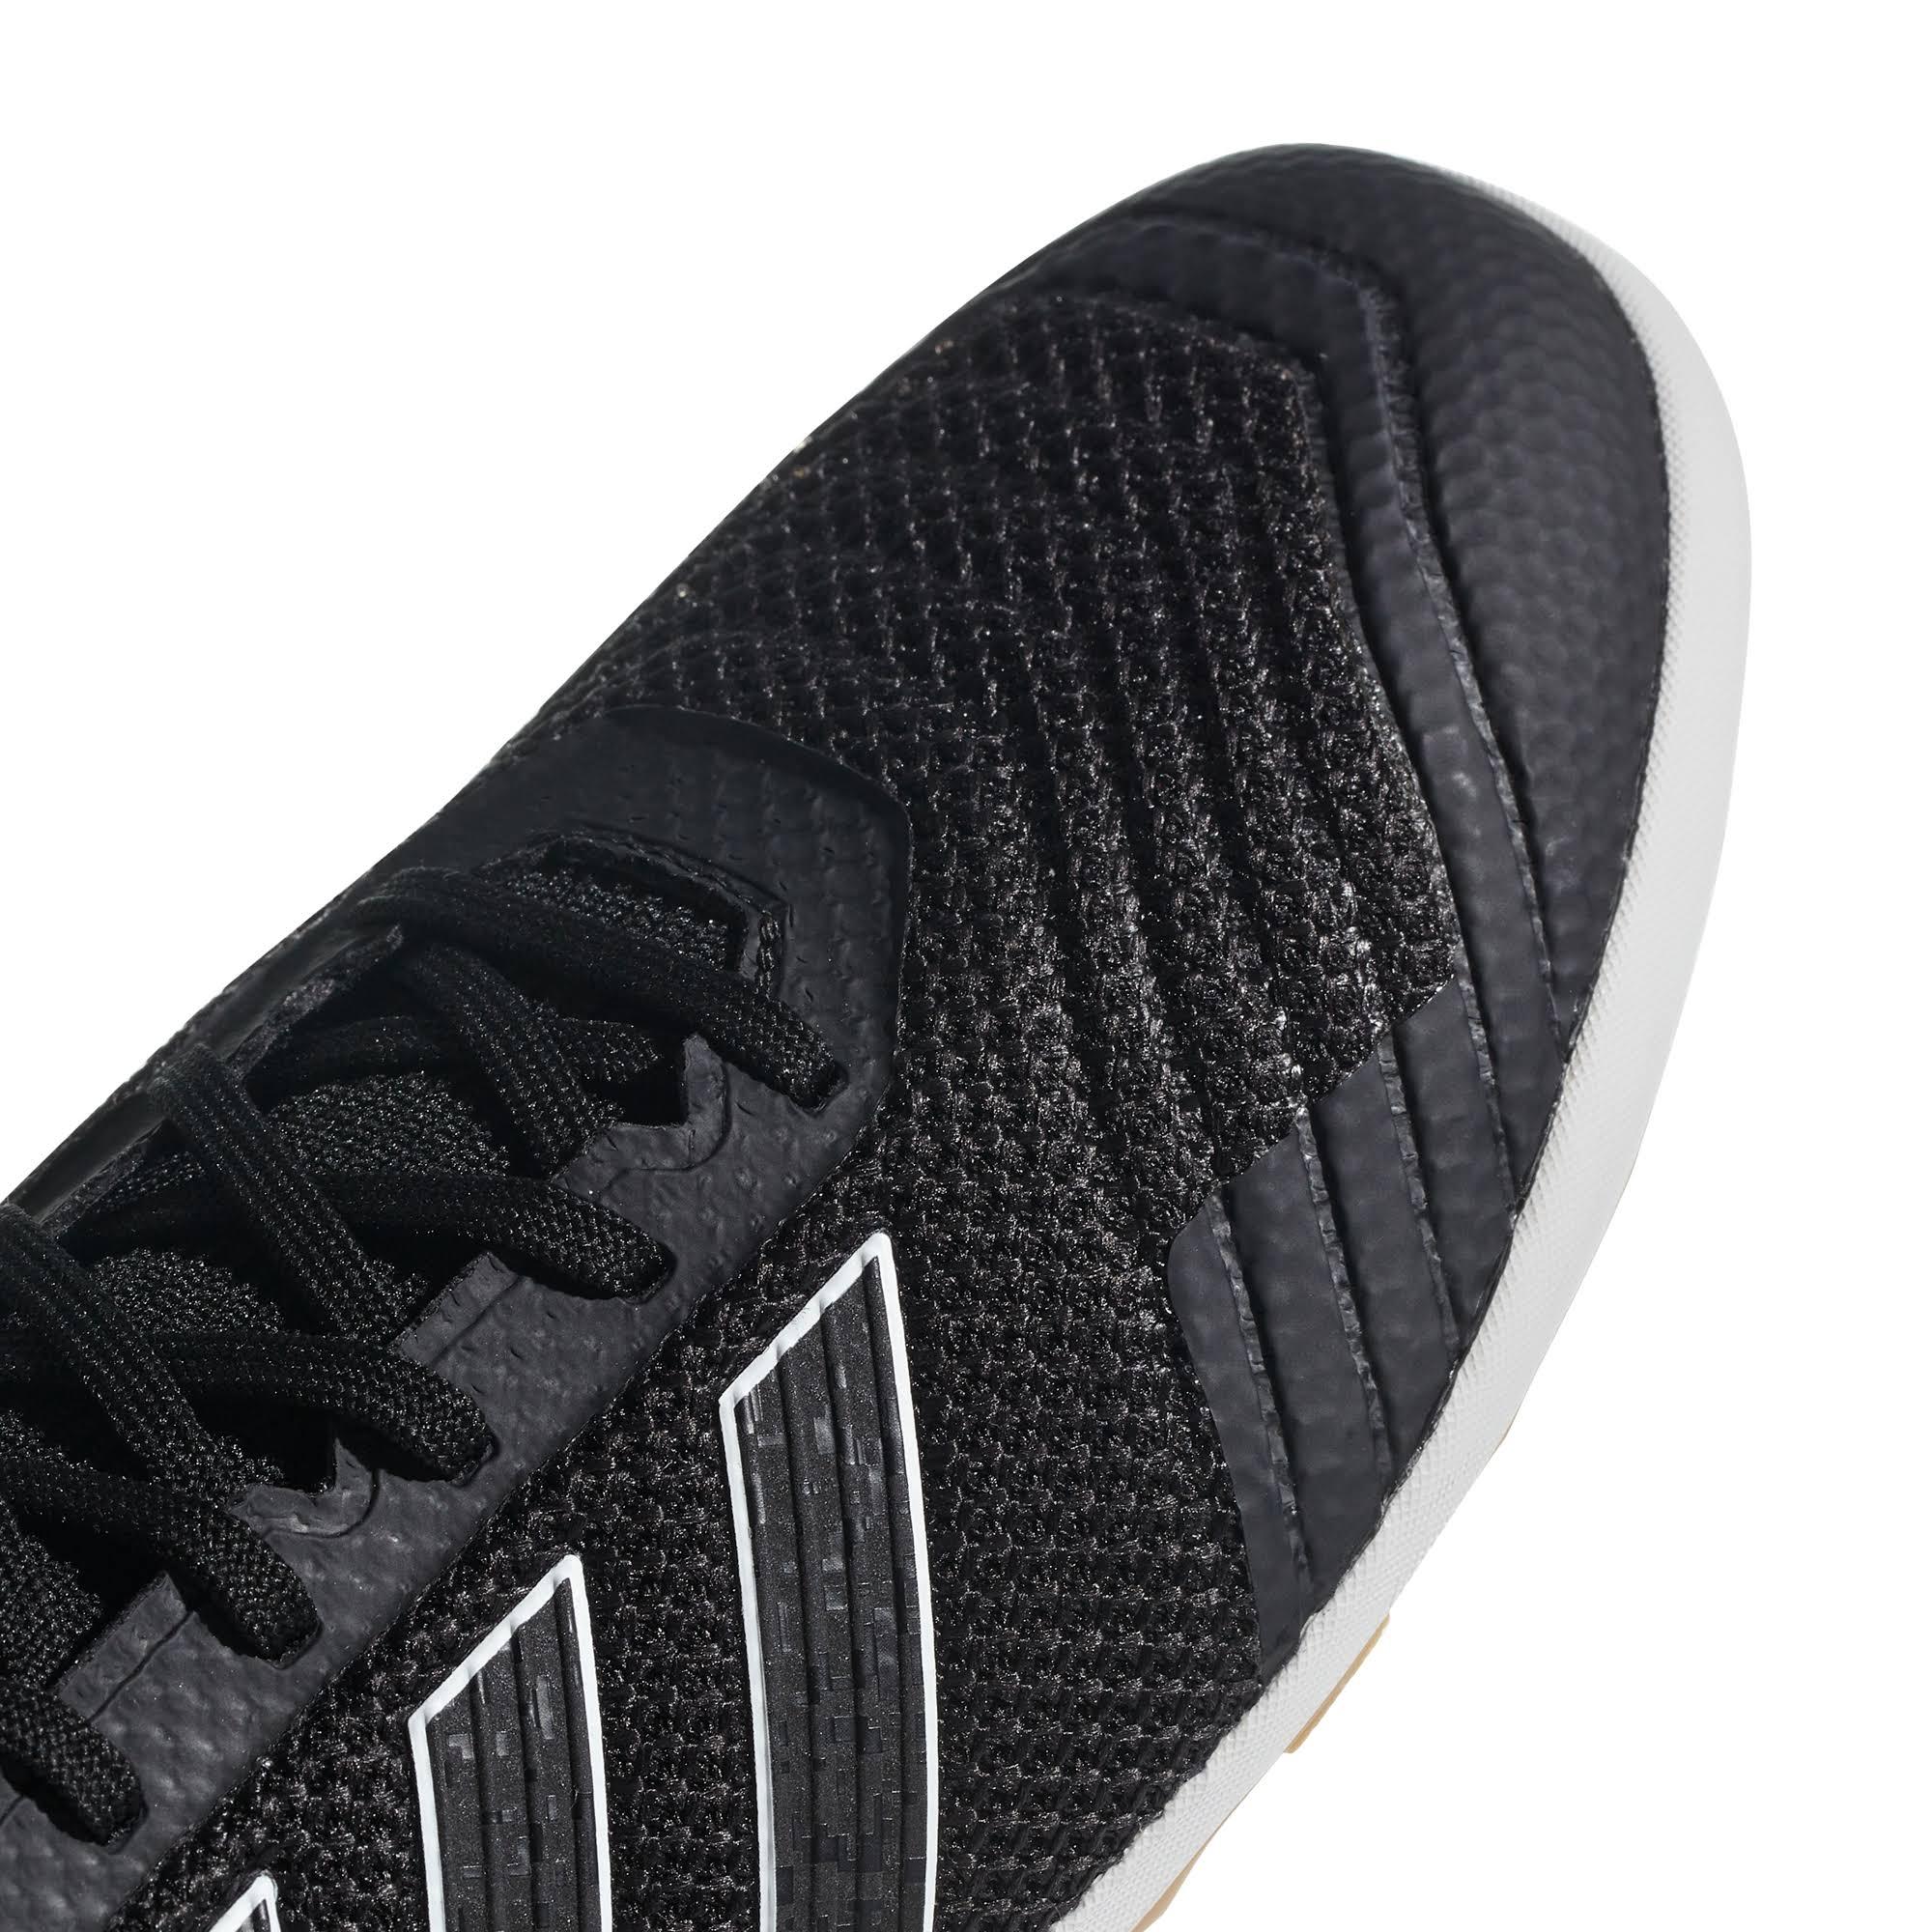 Noir Predator Salle Blanc De Hommes Adidas En Pour In 18 3 Football Chaussures BndqPw